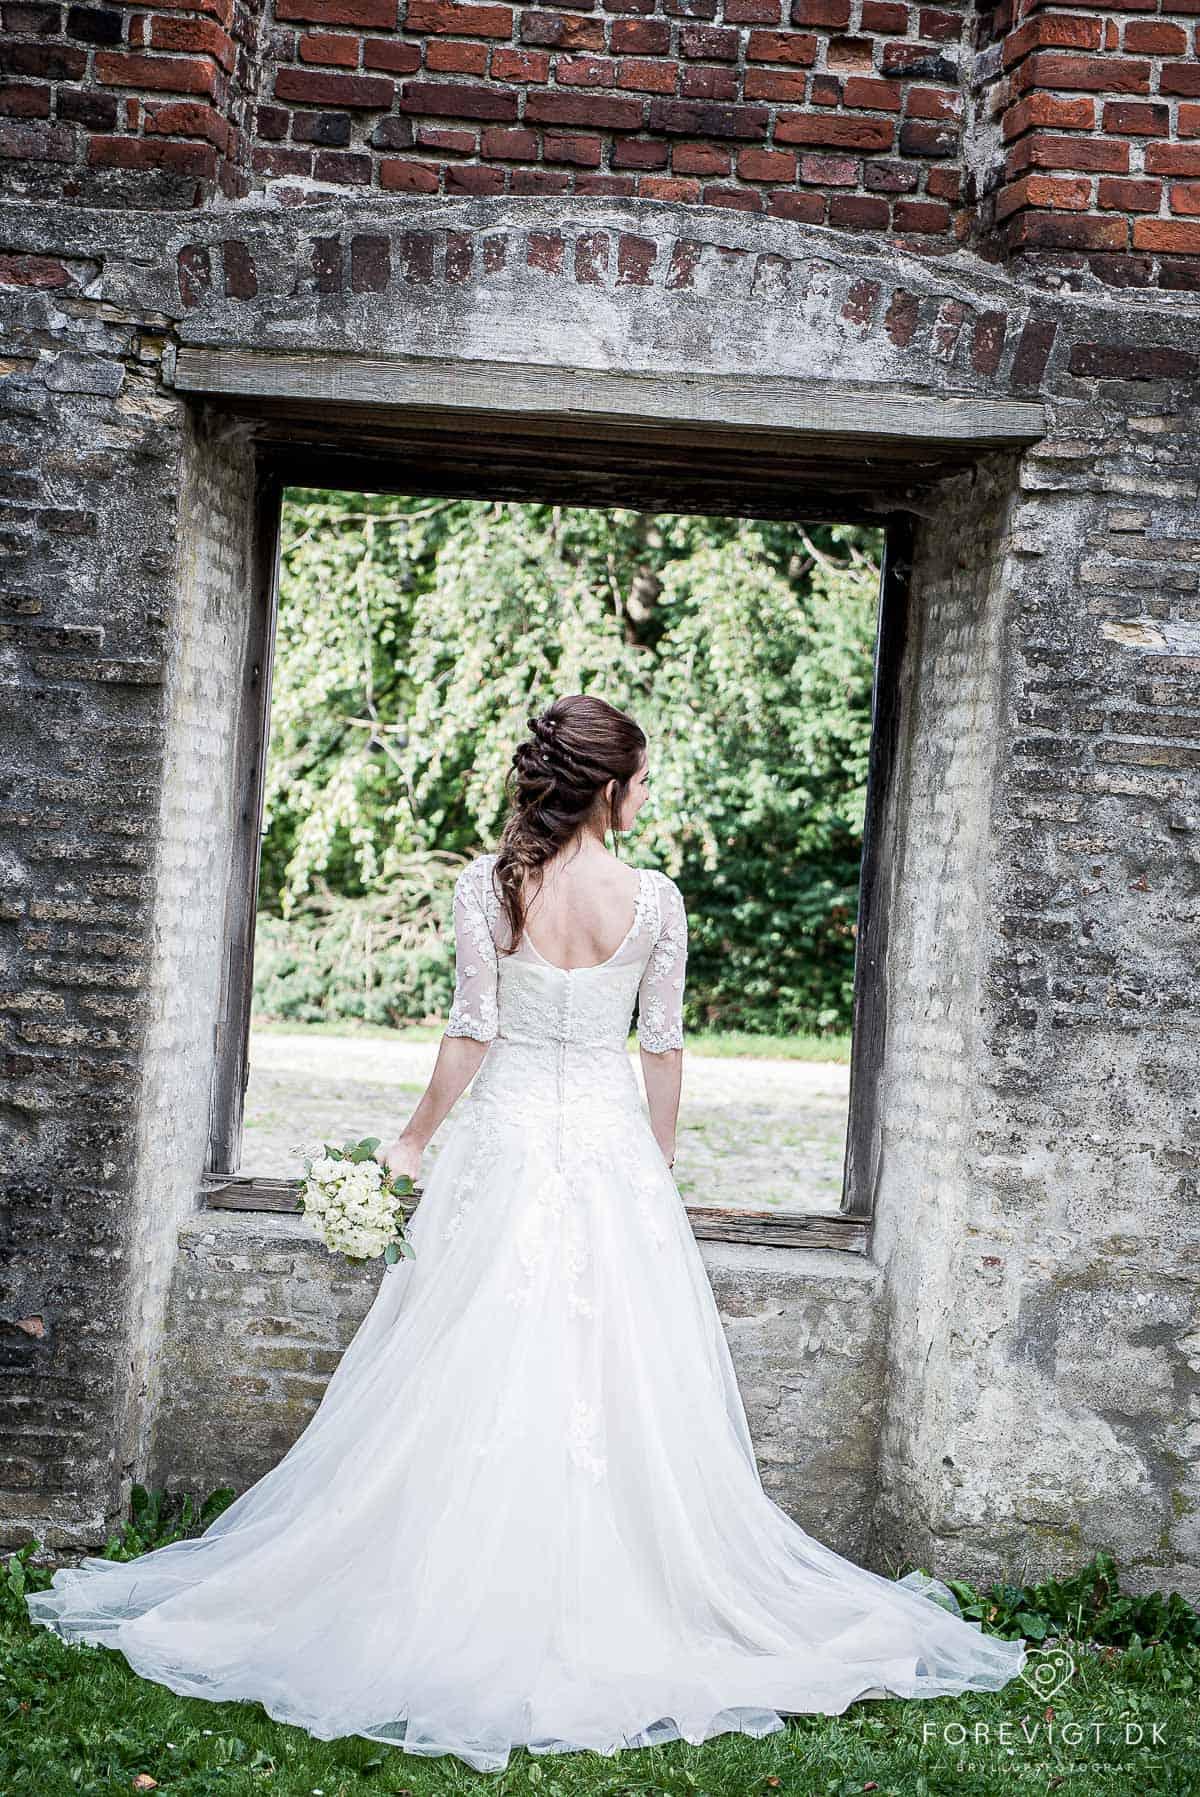 Bagsværd sø bryllupsfoto